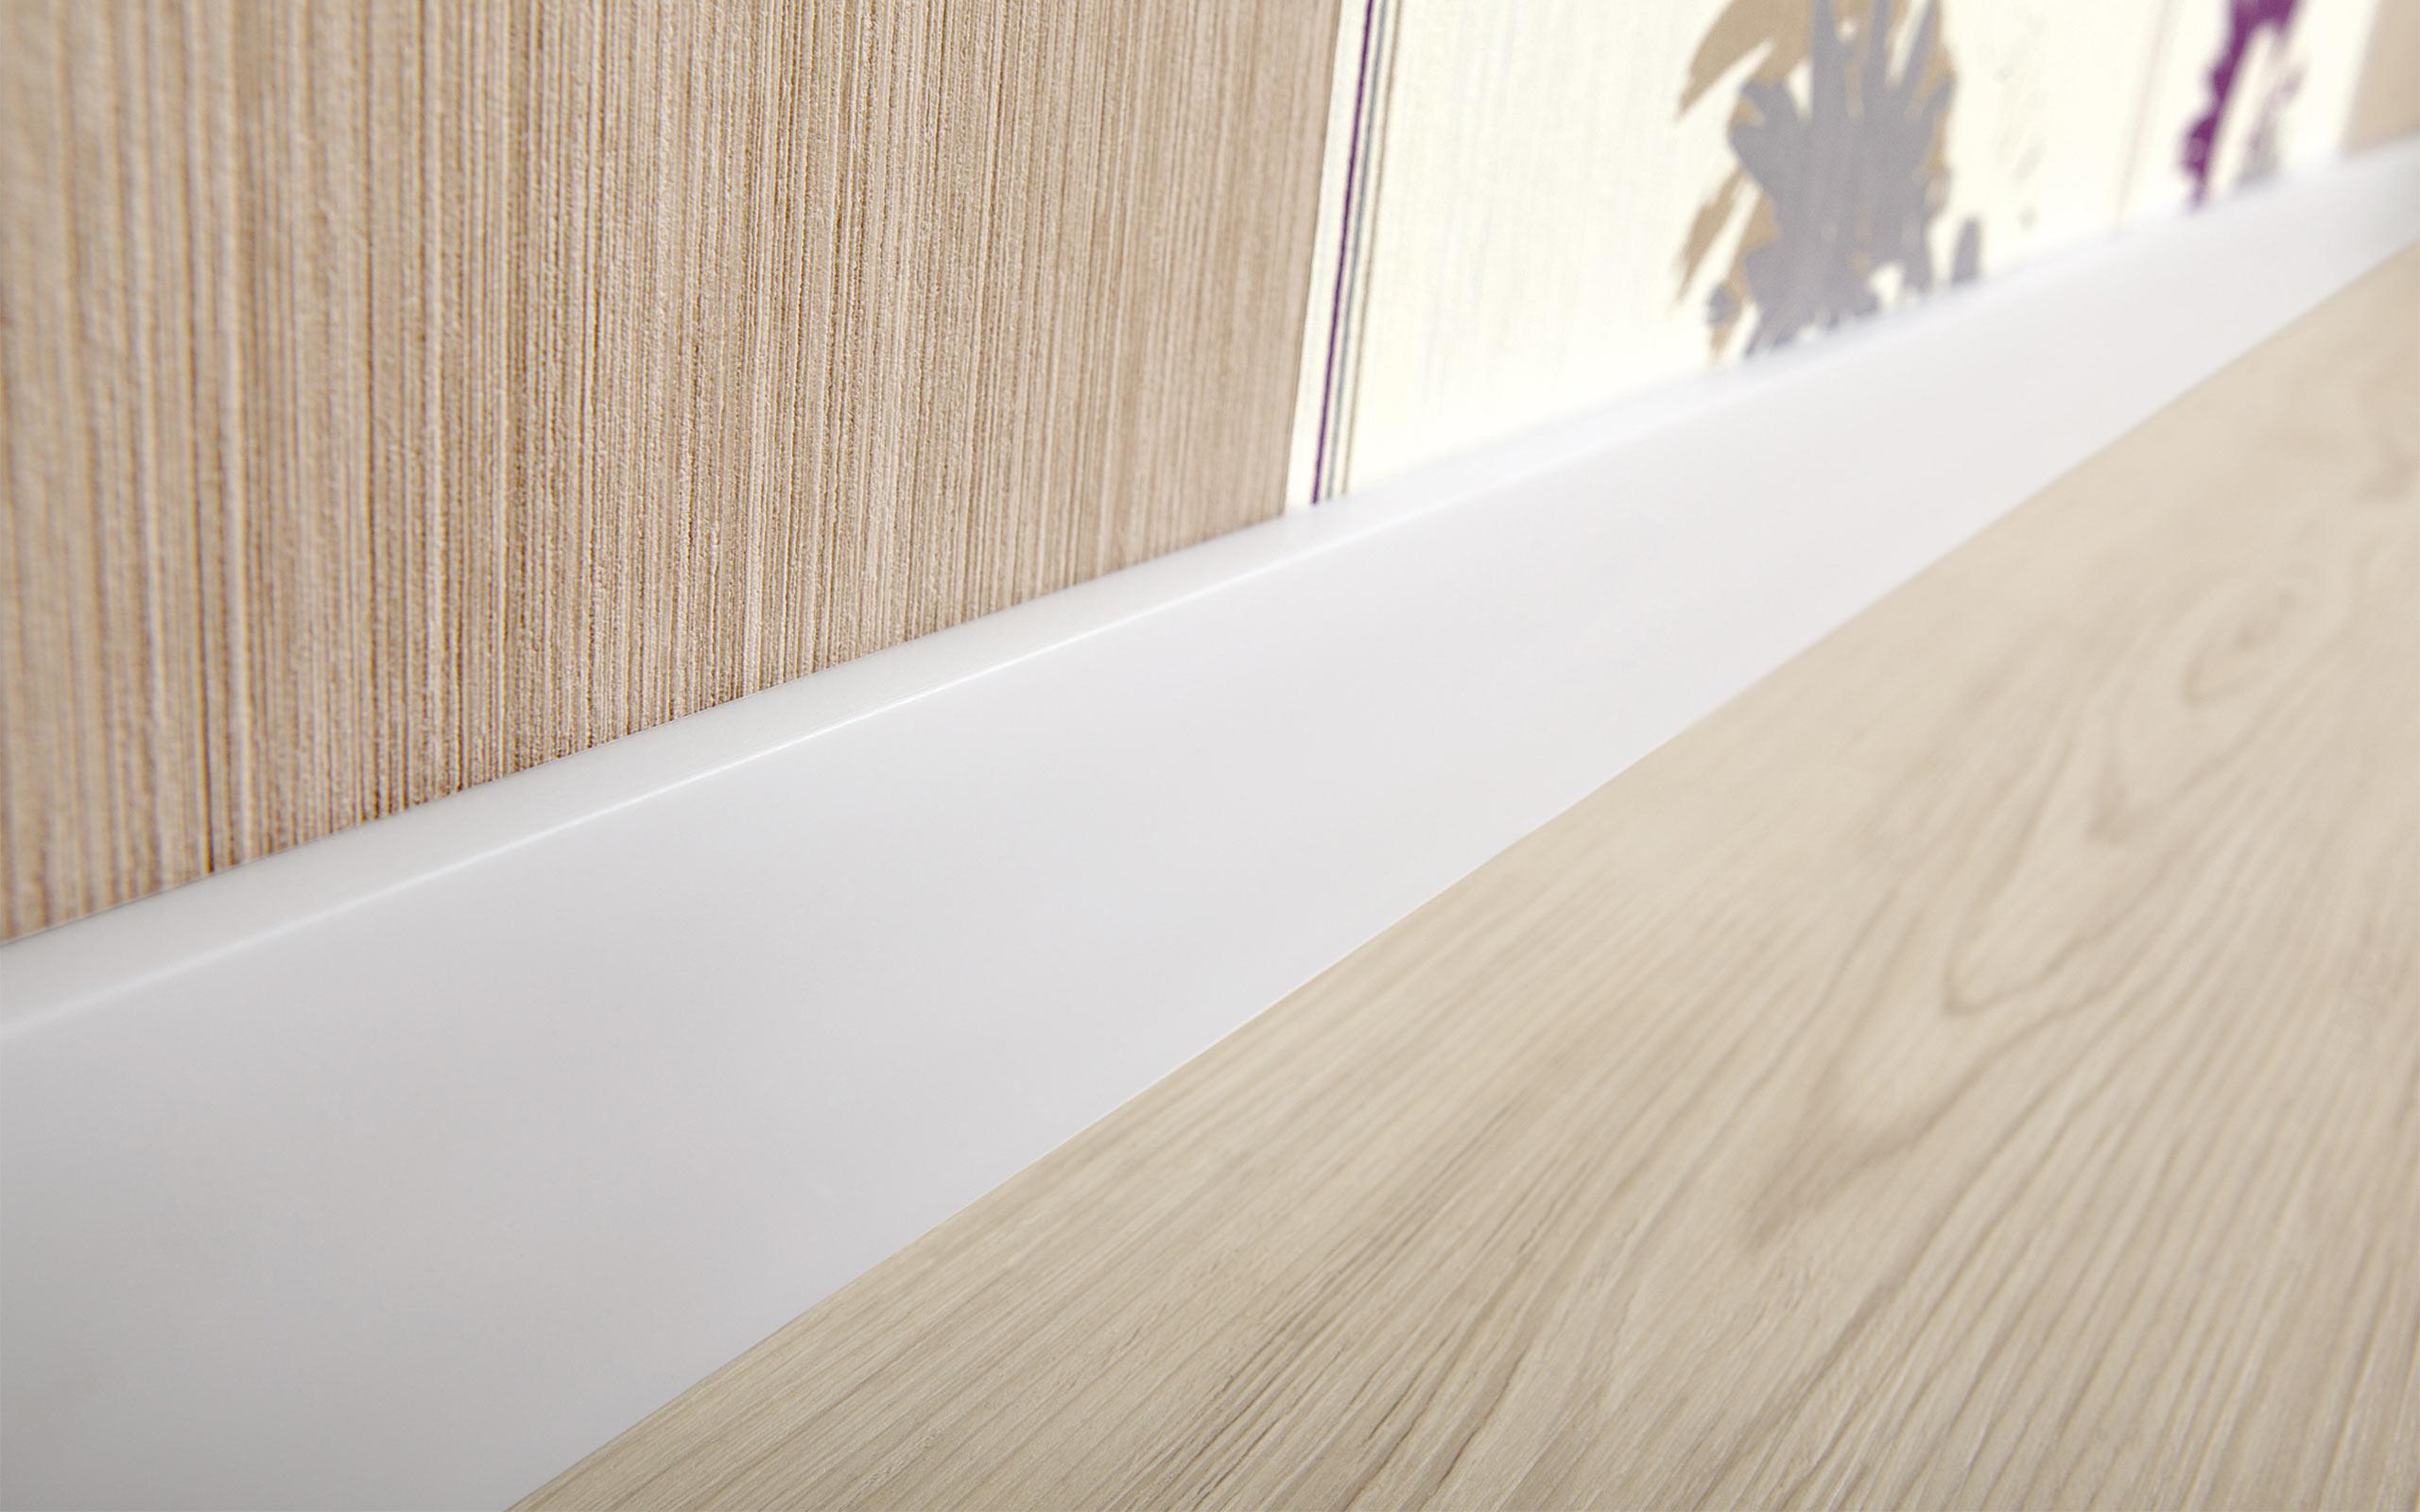 malermeister lothar meyer wandgestaltung bodenverlegearbeiten fassadenbeschichtungen und. Black Bedroom Furniture Sets. Home Design Ideas